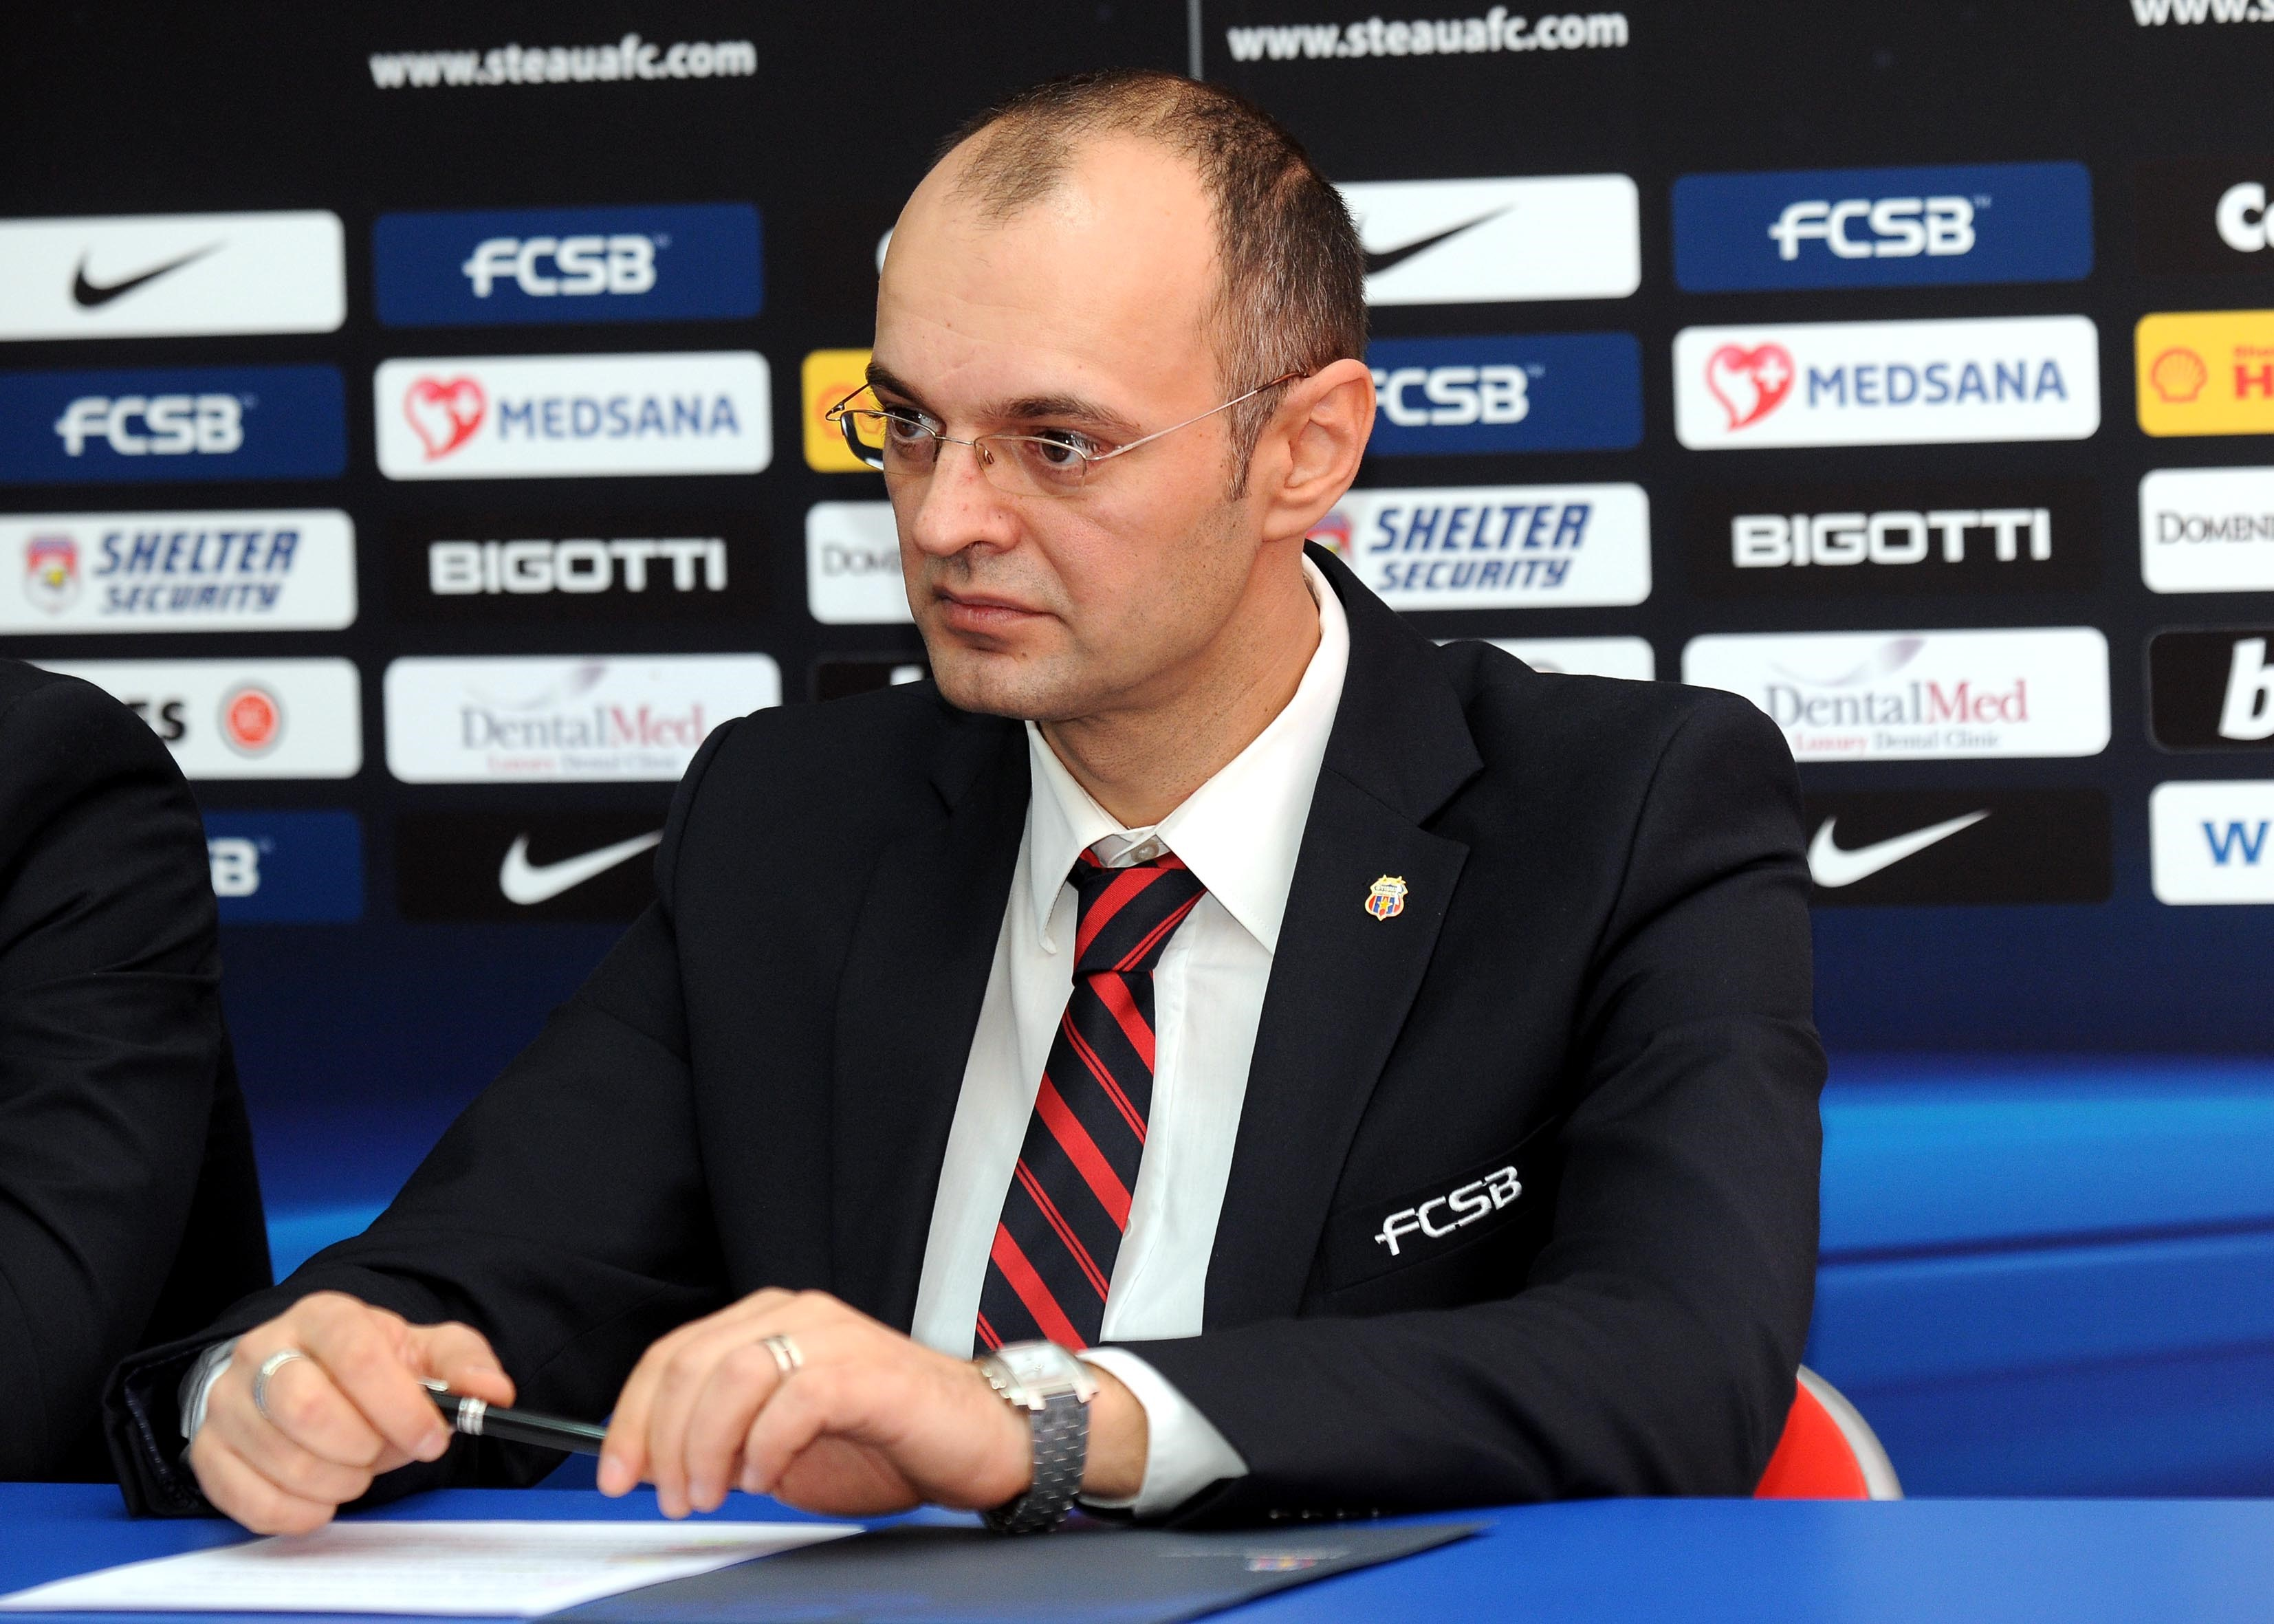 https://i.eurosport.com/2020/06/05/2828514.jpg